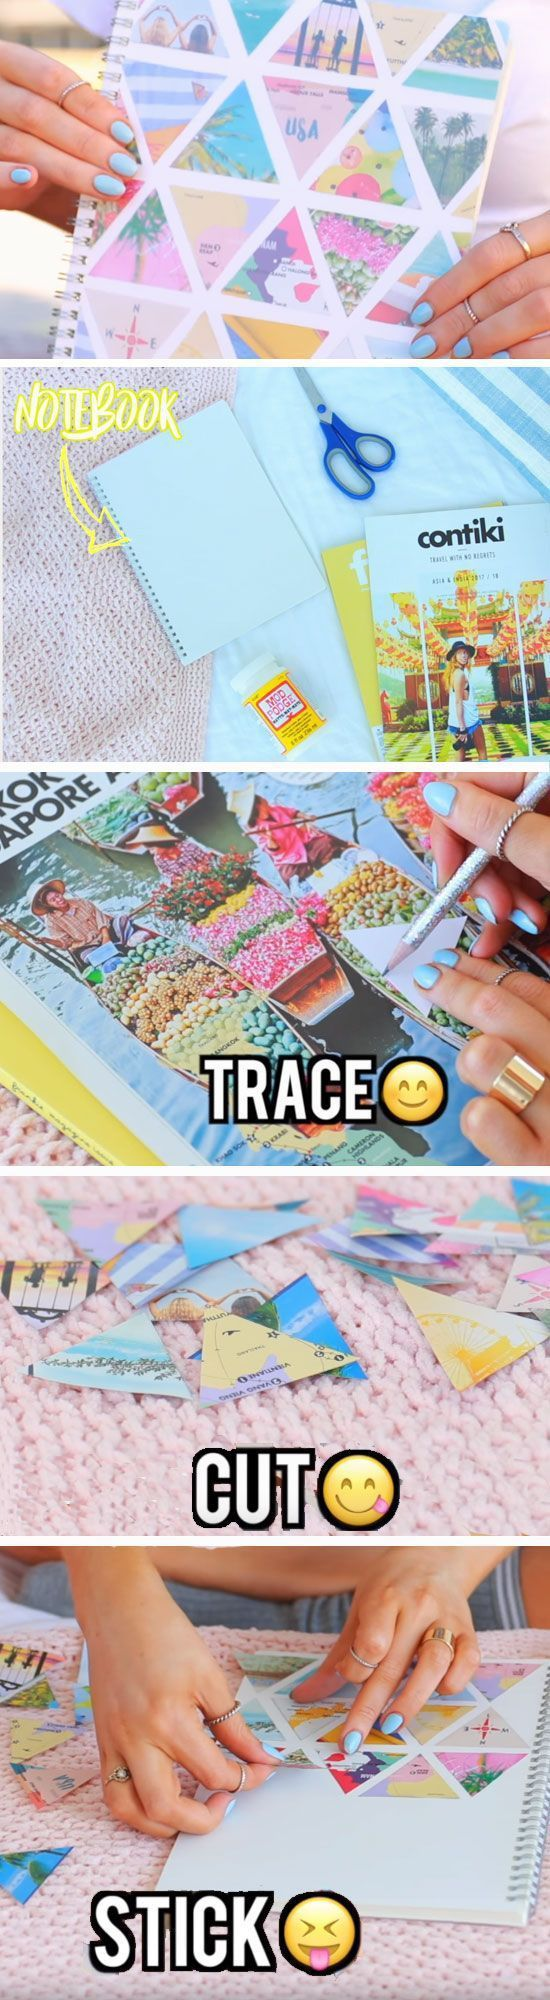 DIY Life Hacks & Crafts : Collage Notebook | DIY School Supplies for Teens Highschool